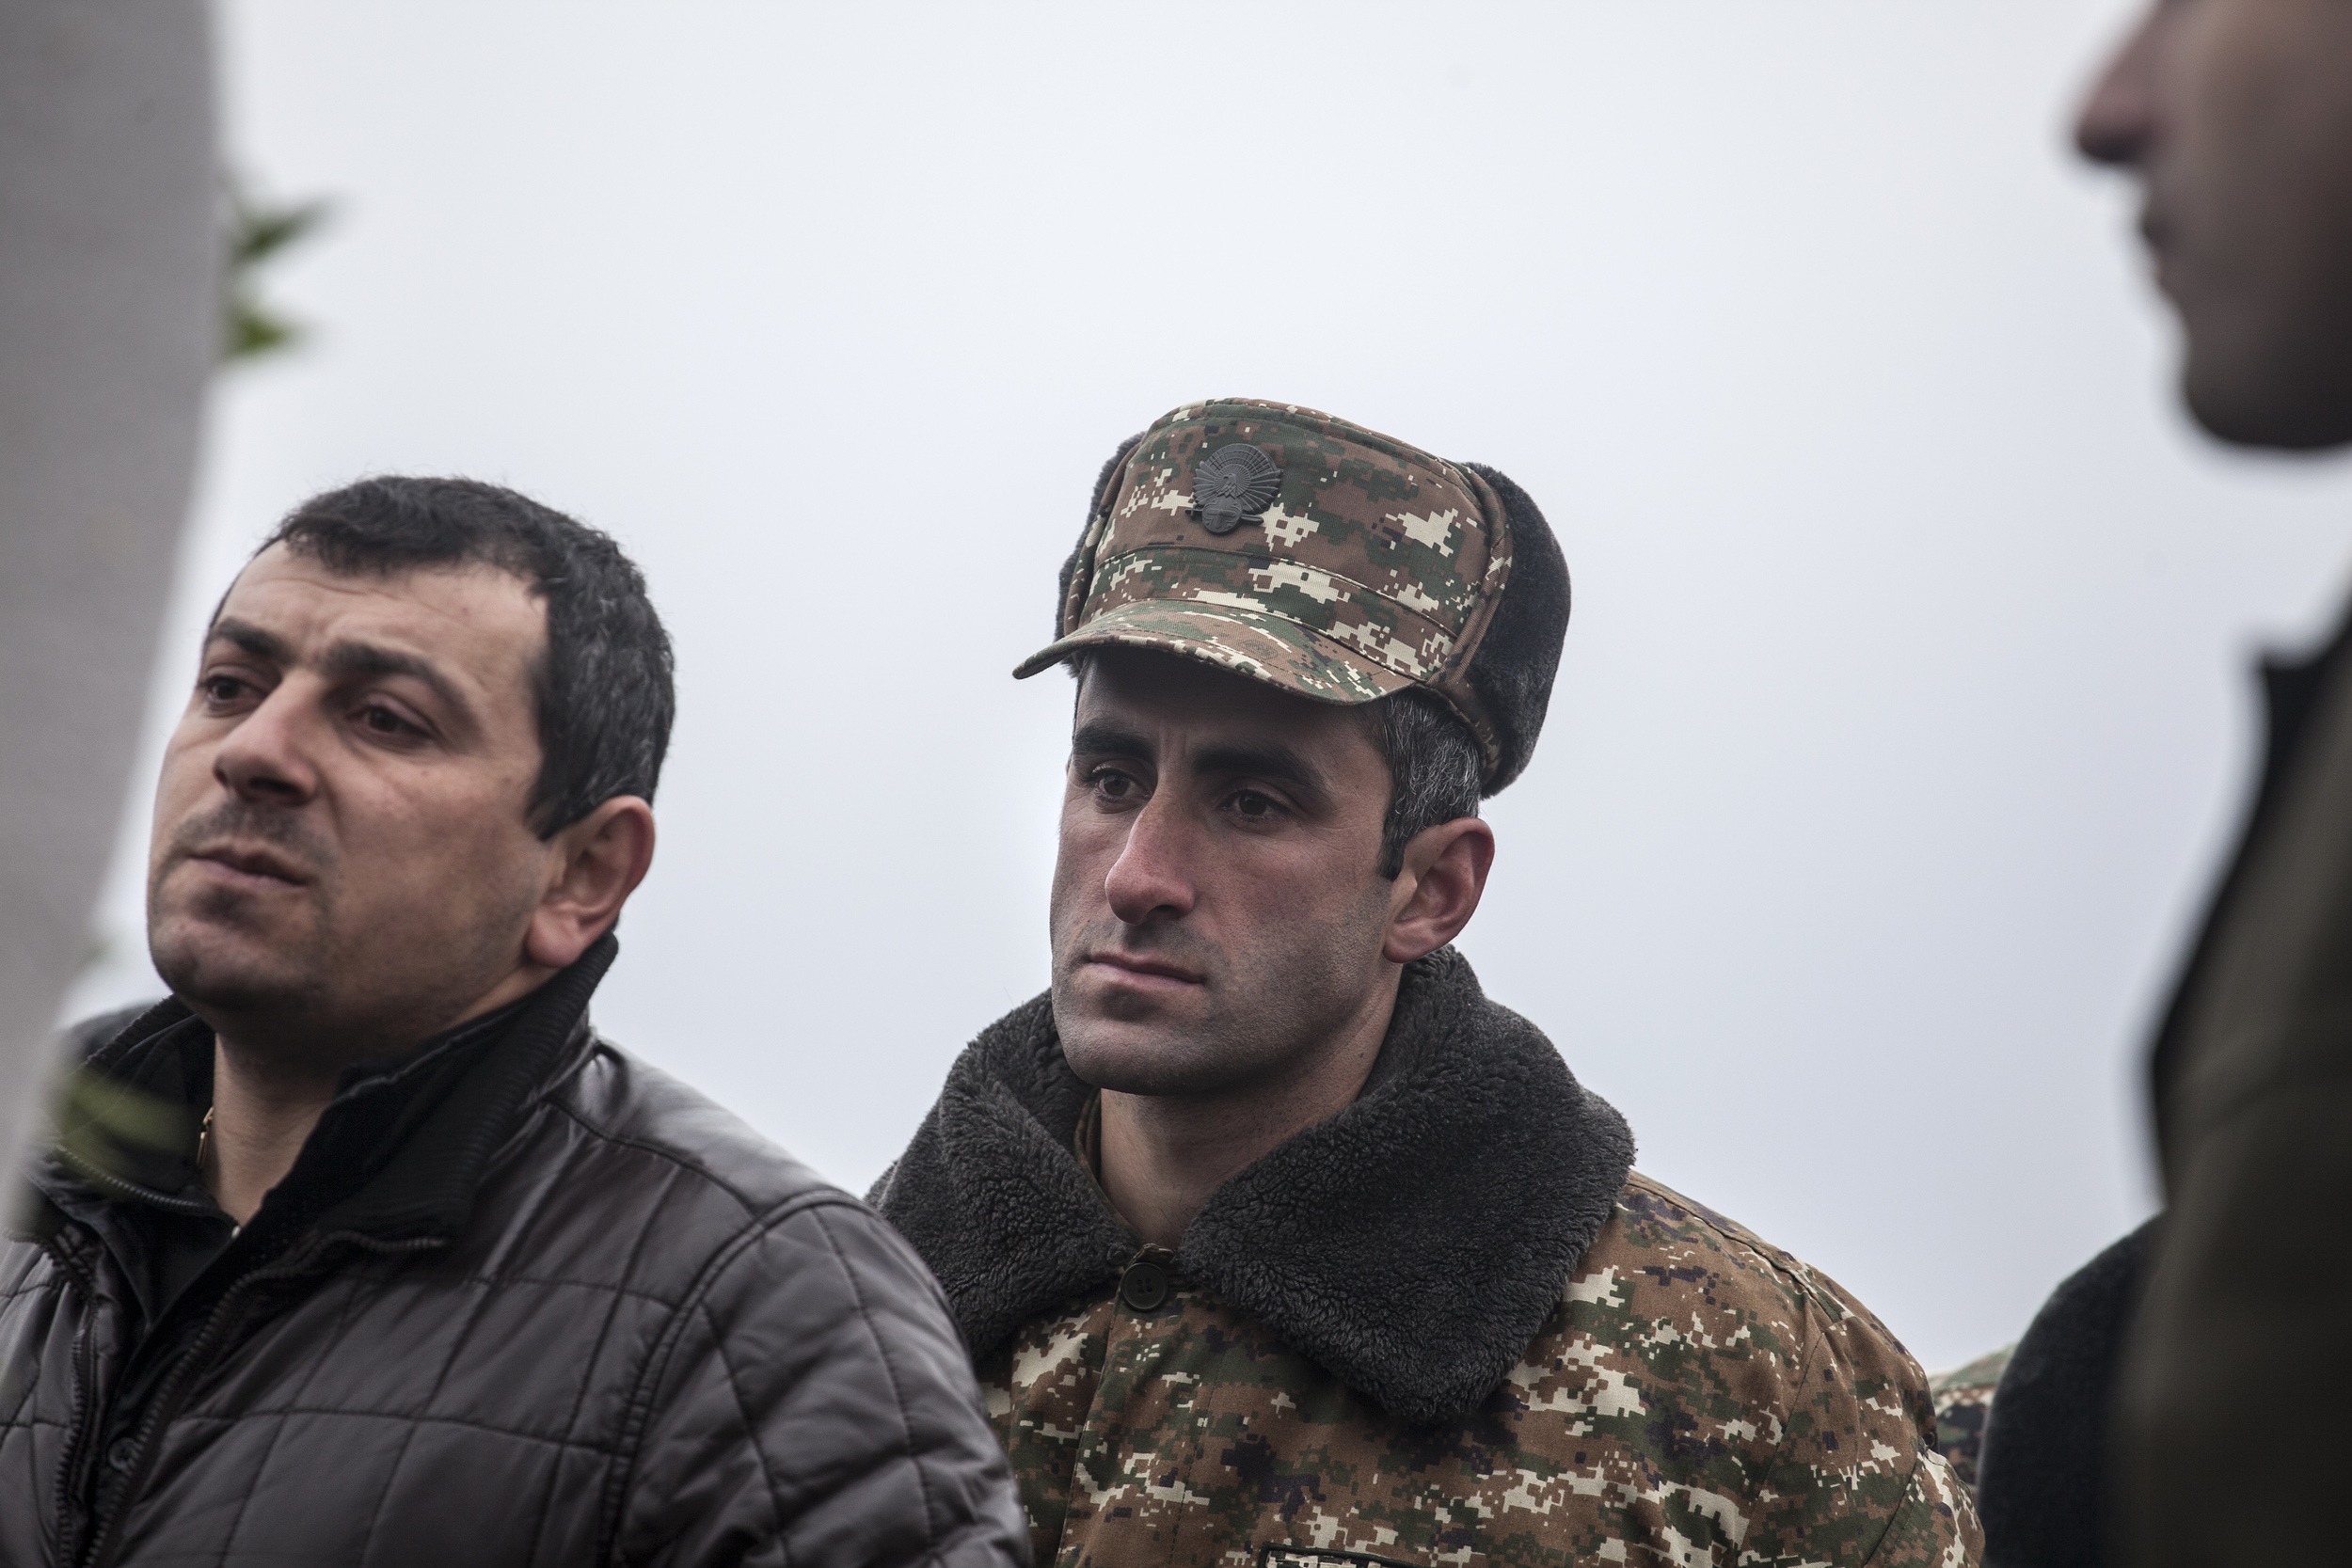 ArmeniaFuneral18.jpg